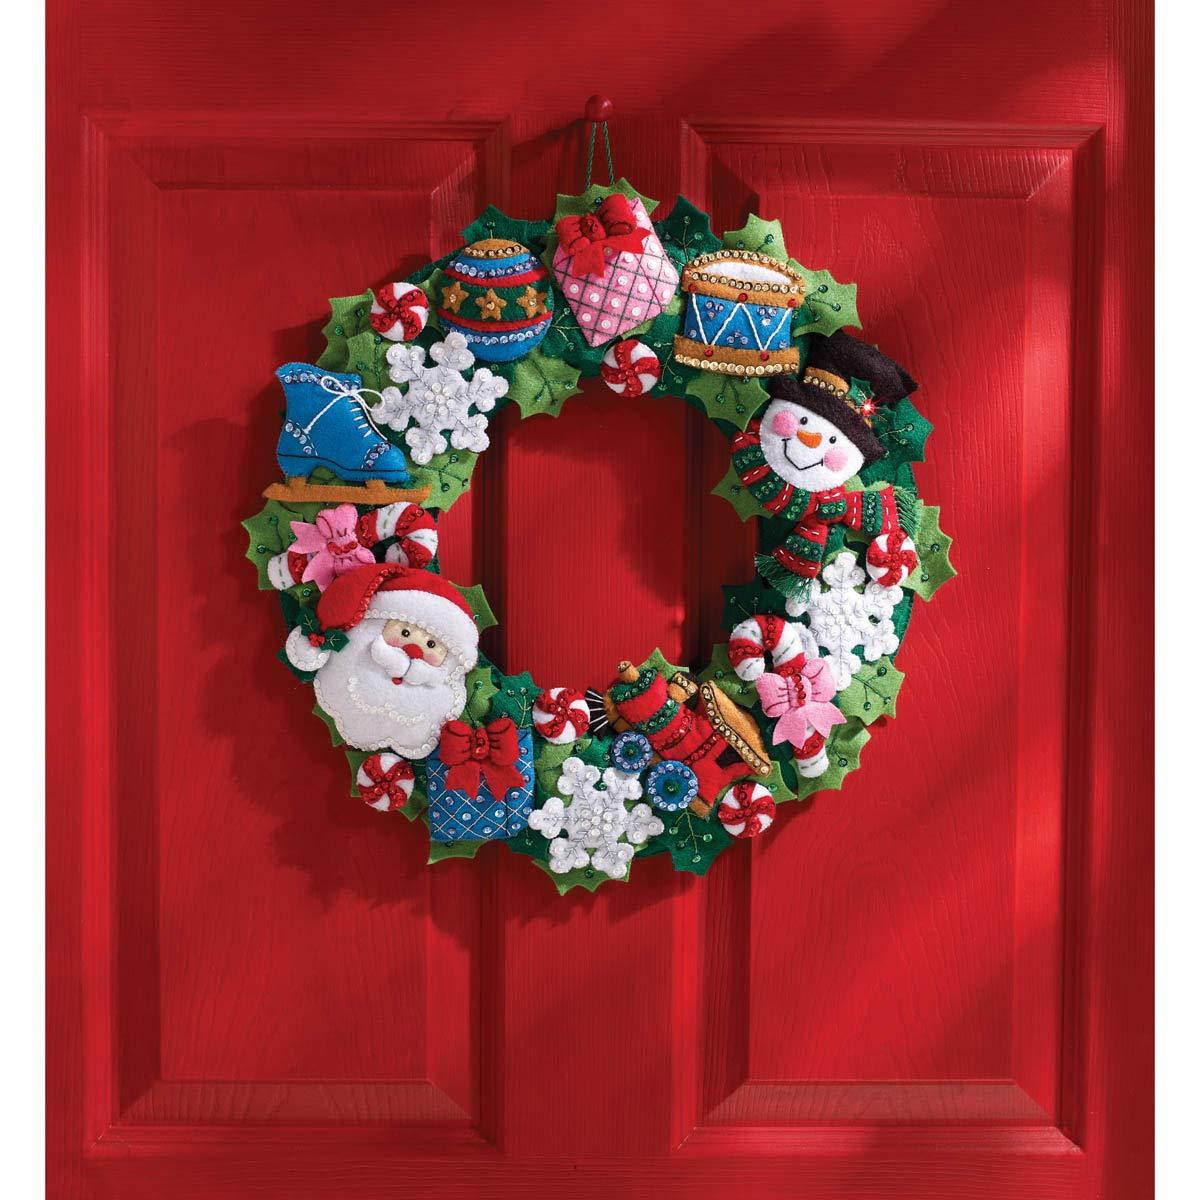 86681 Scottie 16.5 by 14.5-Inch Bucilla Felt Applique Wreath Kit